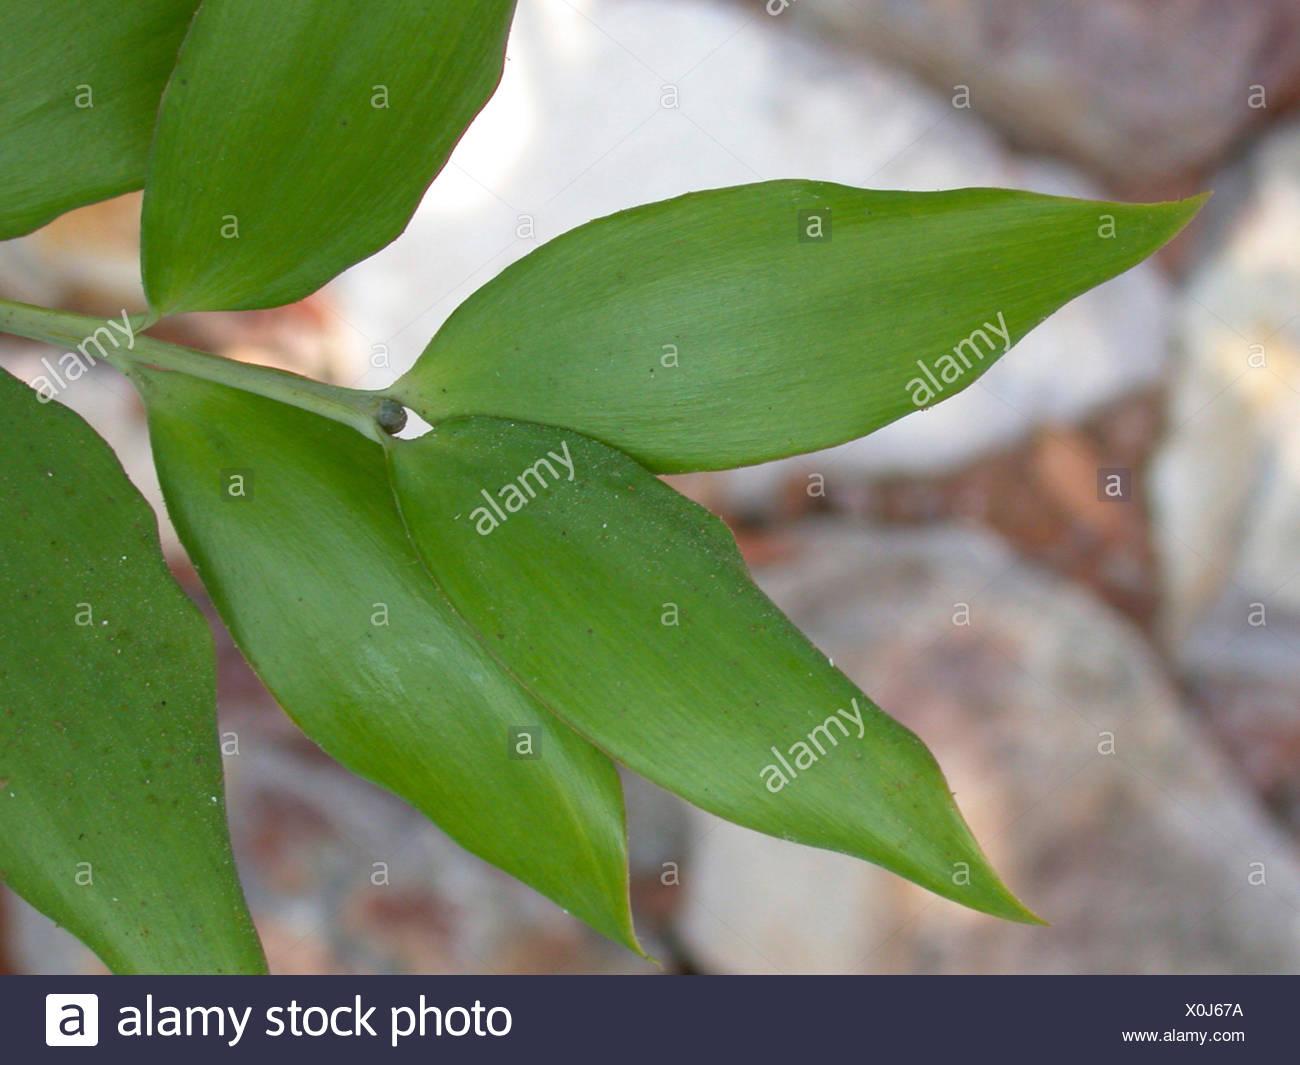 Queensland Kauri, Smooth-barked Kauri (Agathis robusta, Agathis palmerstonii), leaves - Stock Image